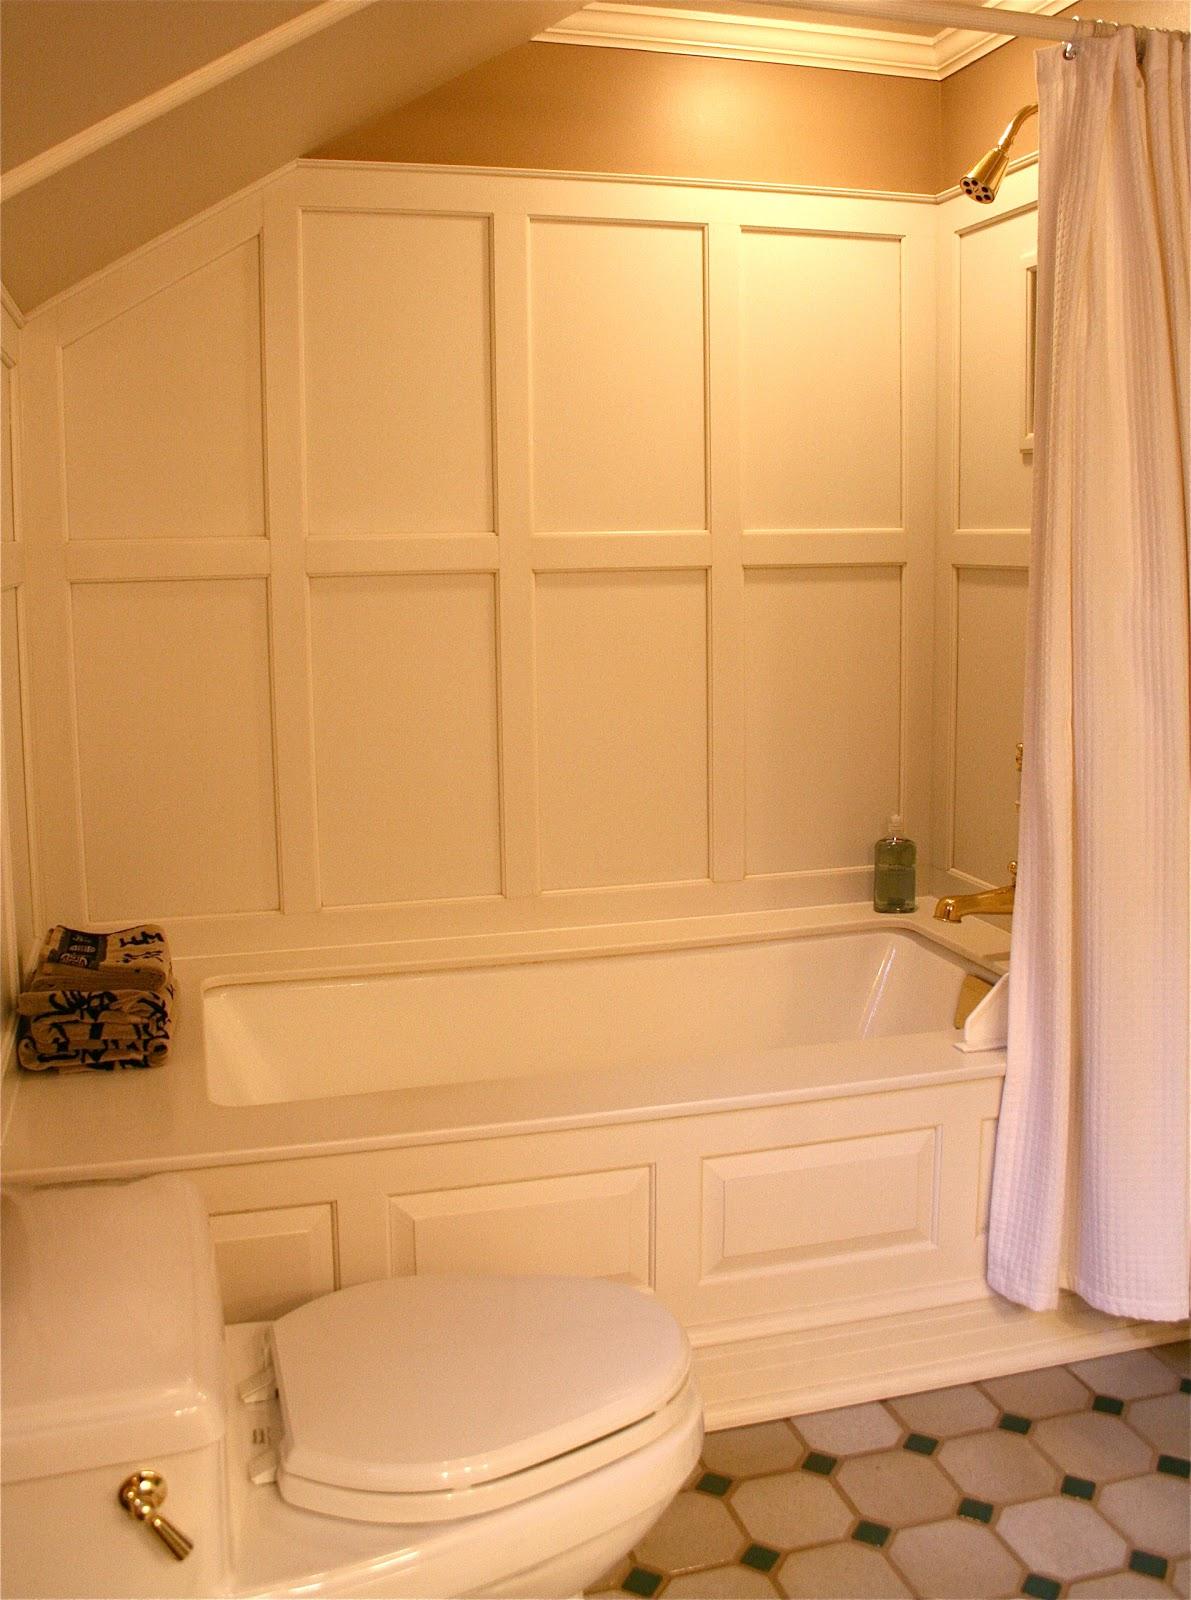 Bath Shower Surrounds Antiqueaholics Bathtub Surround Paneled With Corian